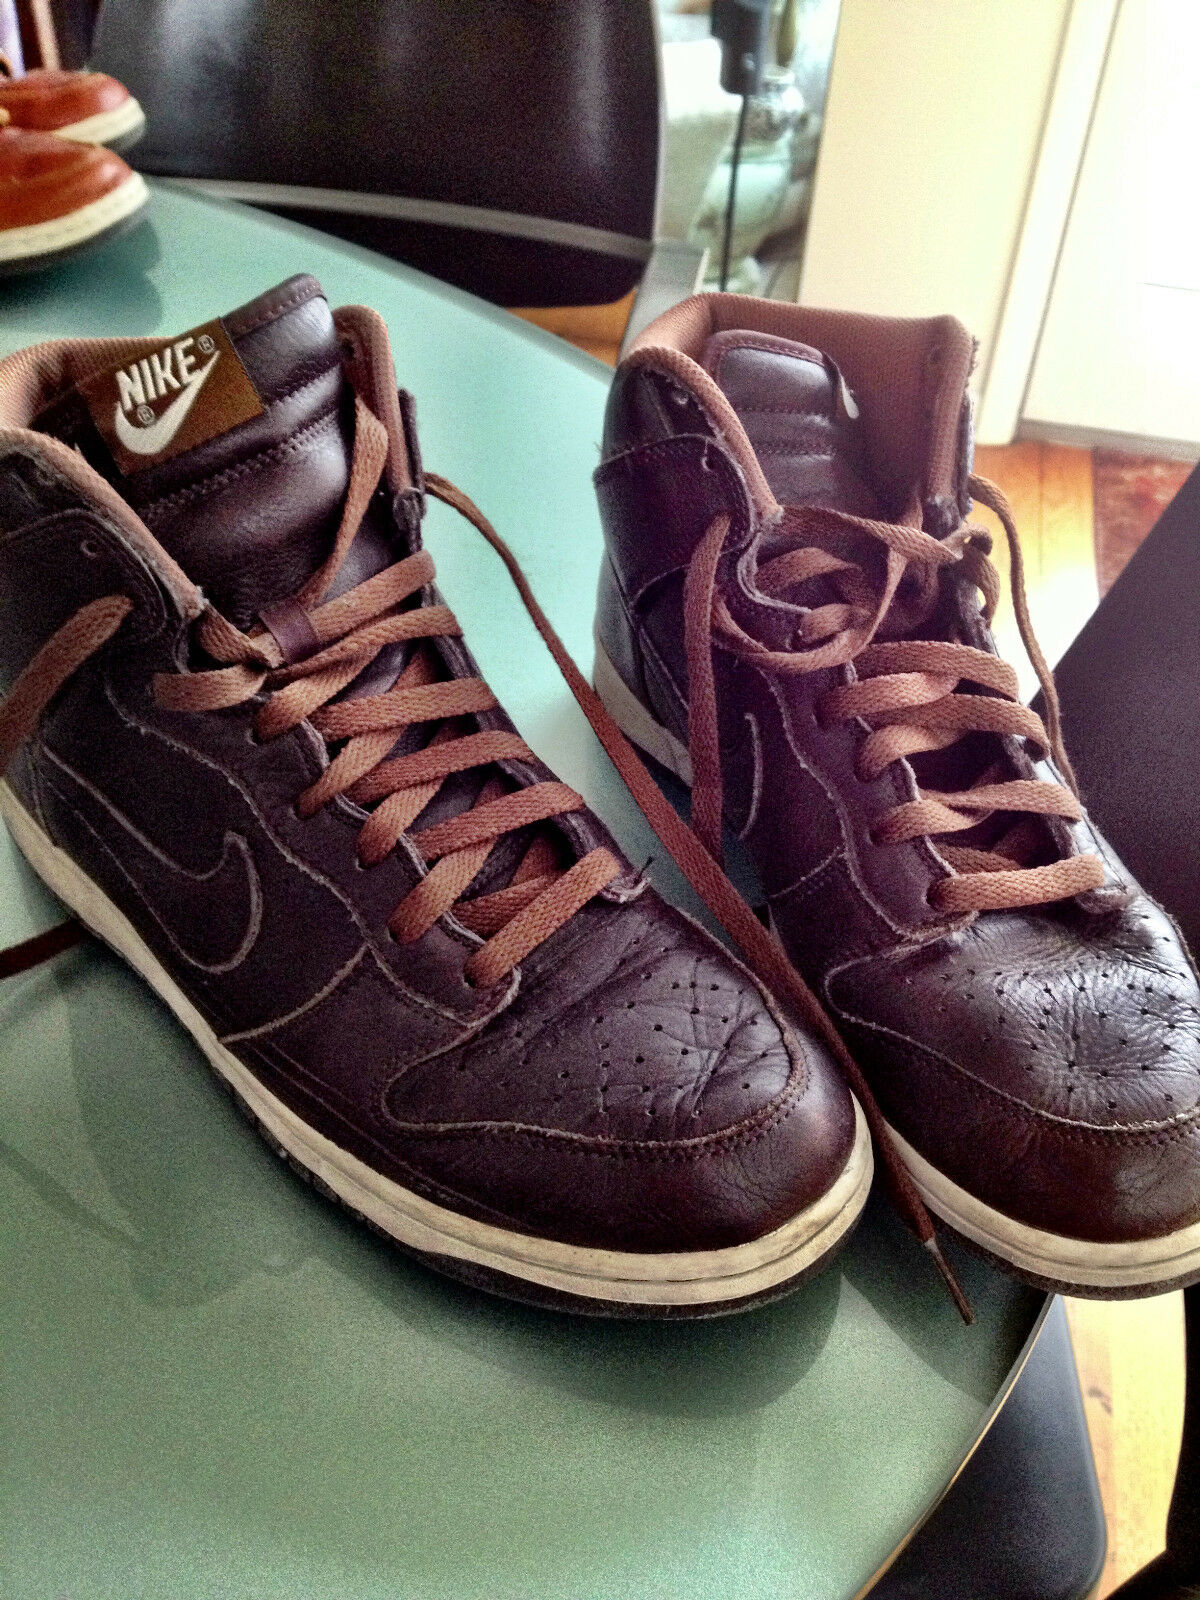 Nike Dunk Abedul High Premium Barroco marrón Abedul Dunk 16ec7d